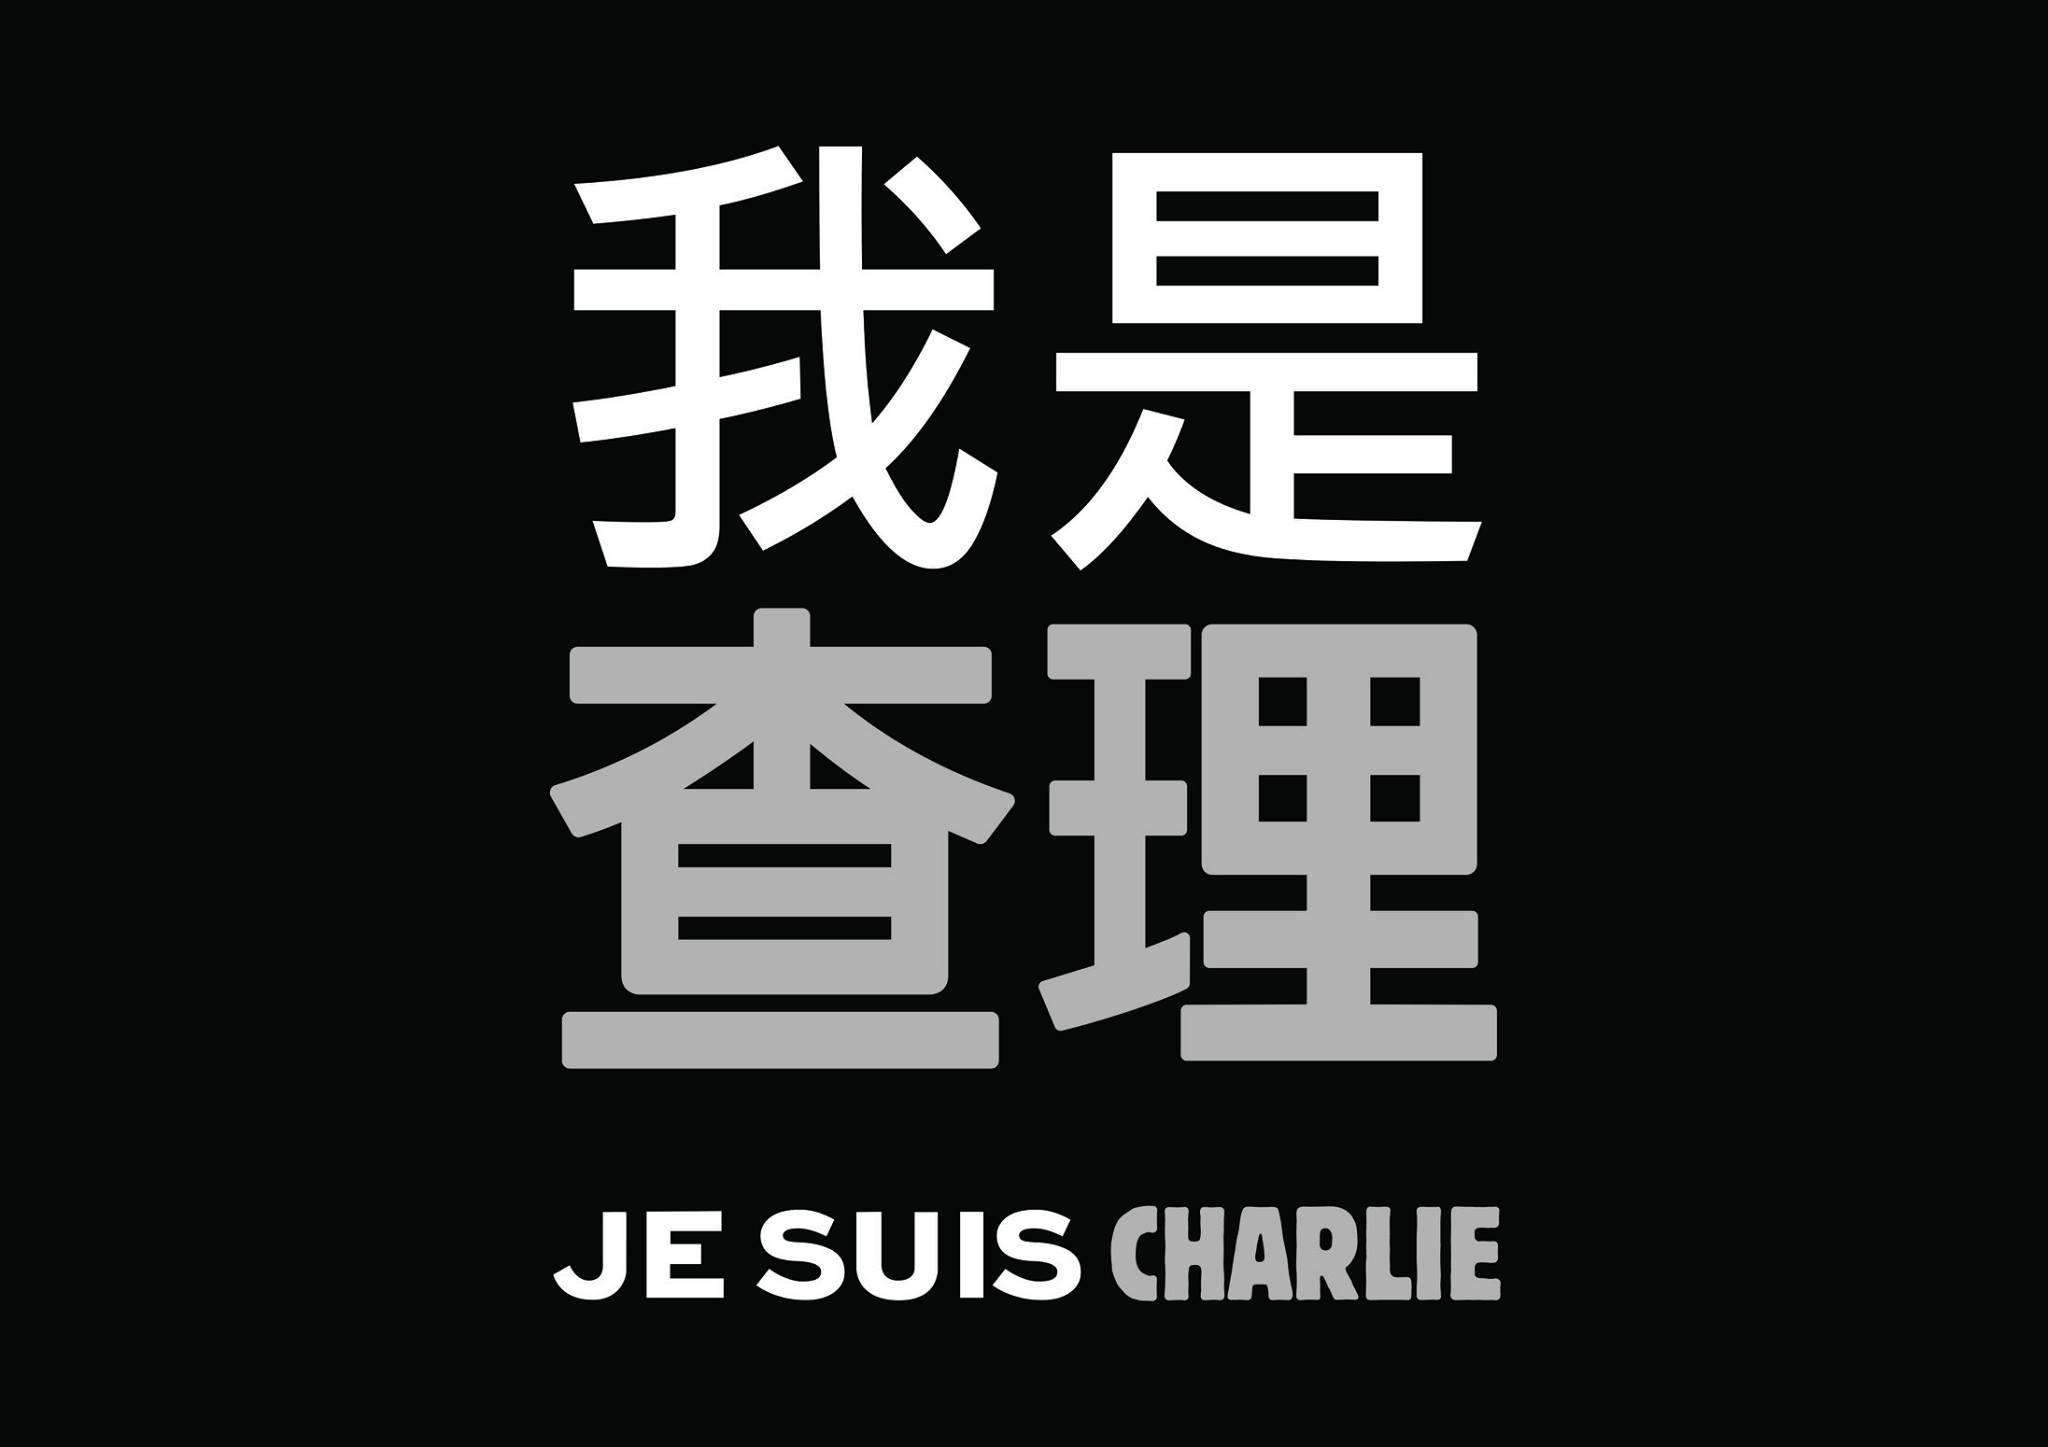 Drawing the News: Wo Shi Chali (Je Suis Charlie)